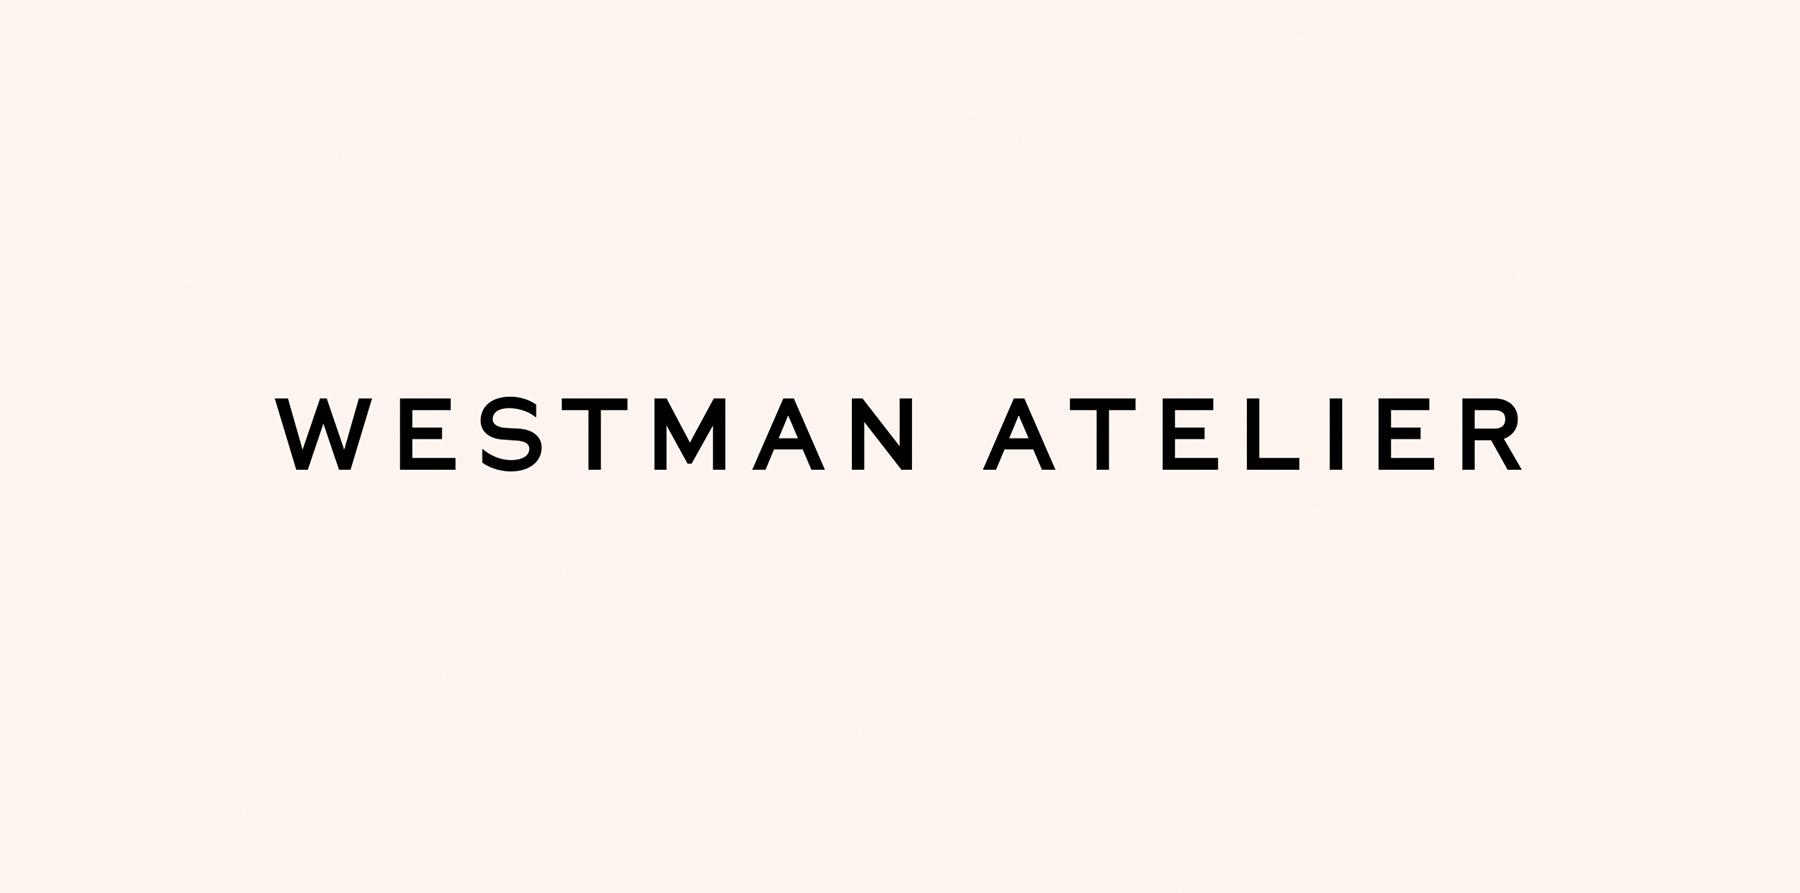 Westman Atelier